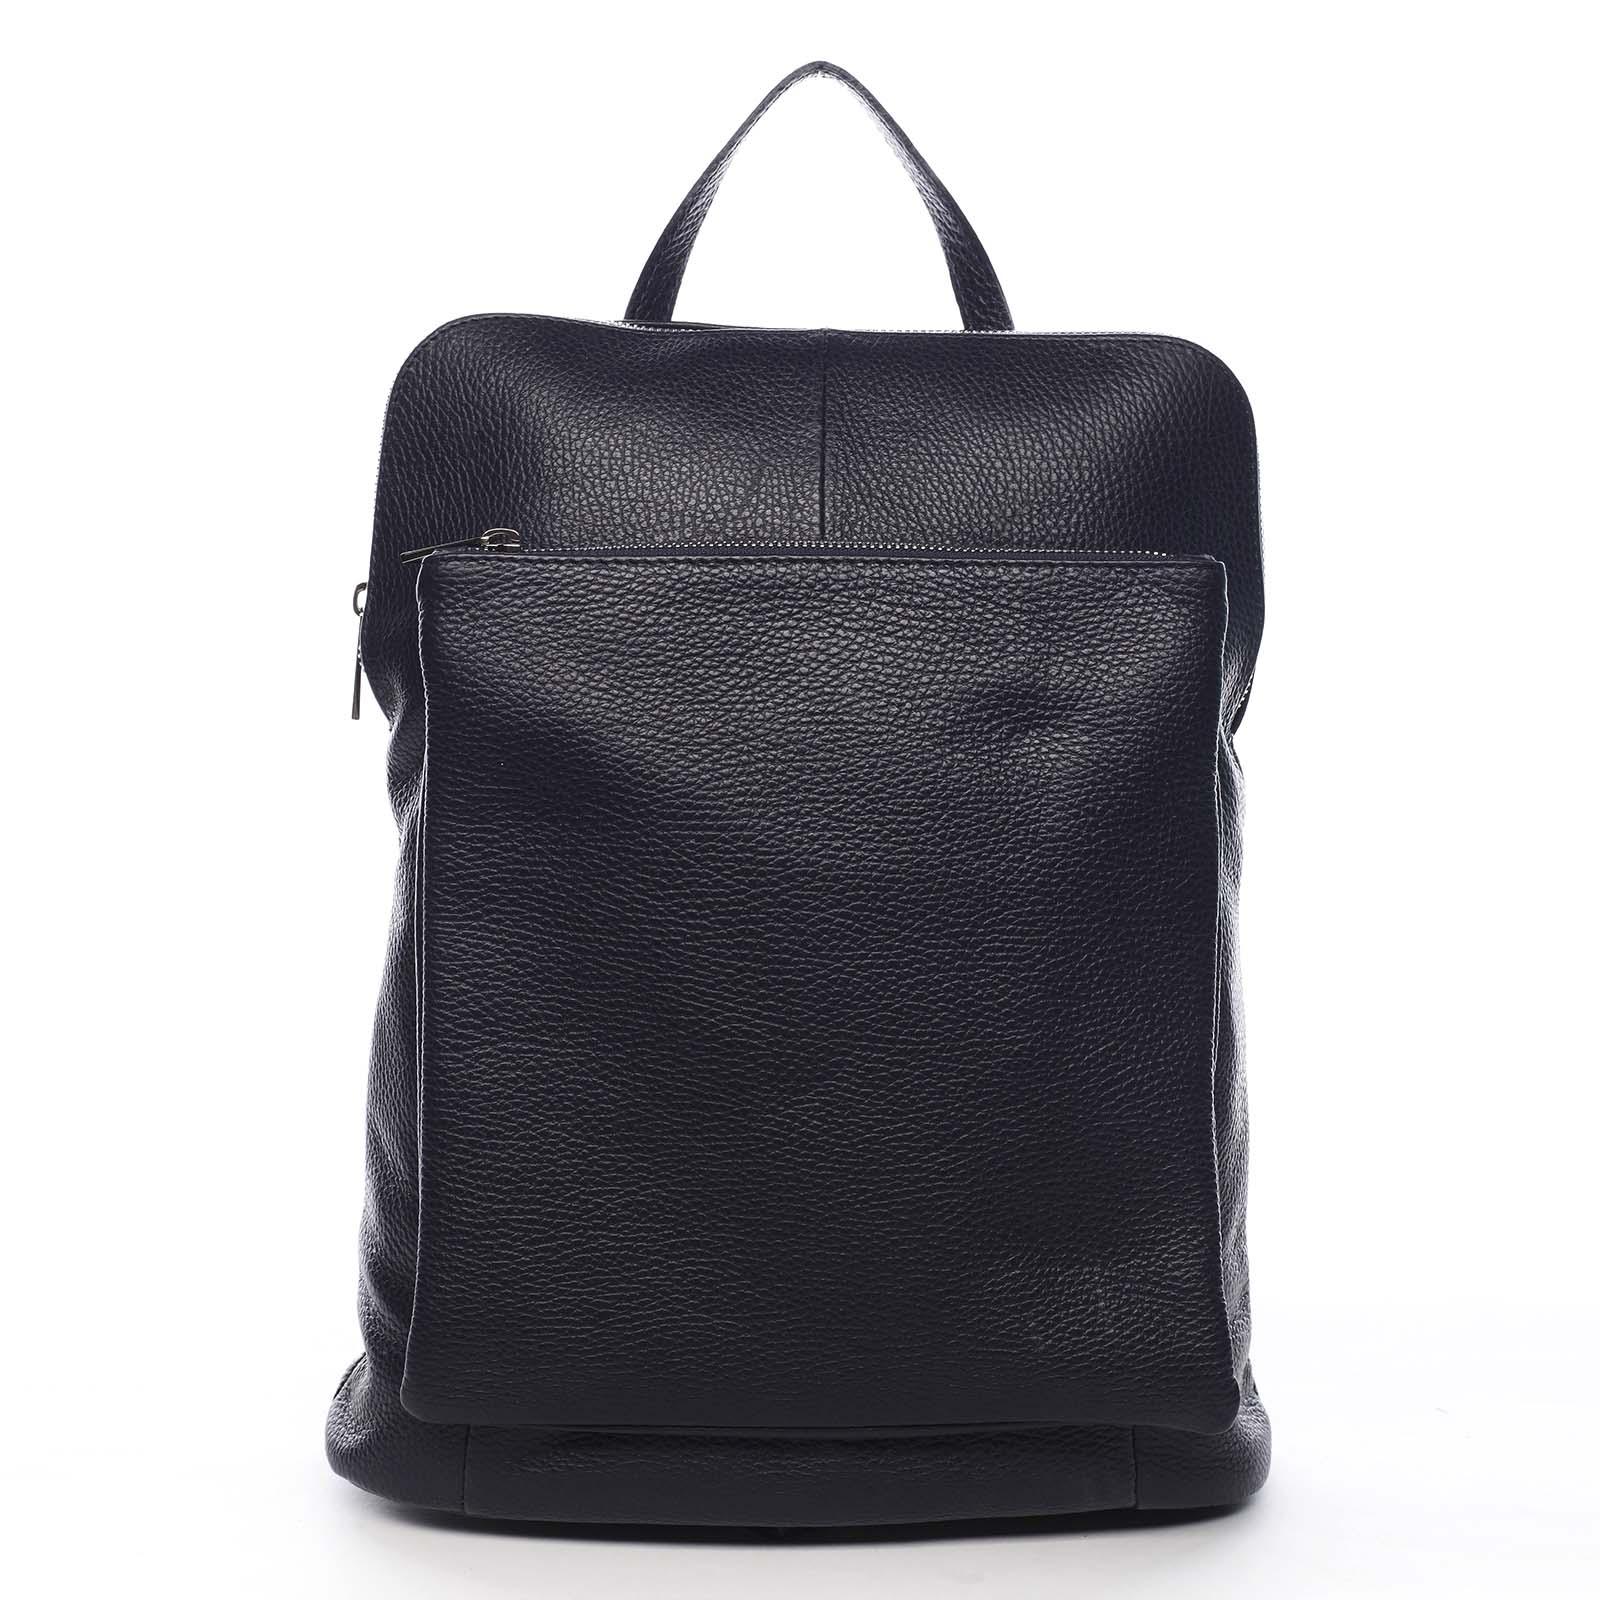 Dámsky kožený batôžtek kabelka čierny - ItalY Houtel